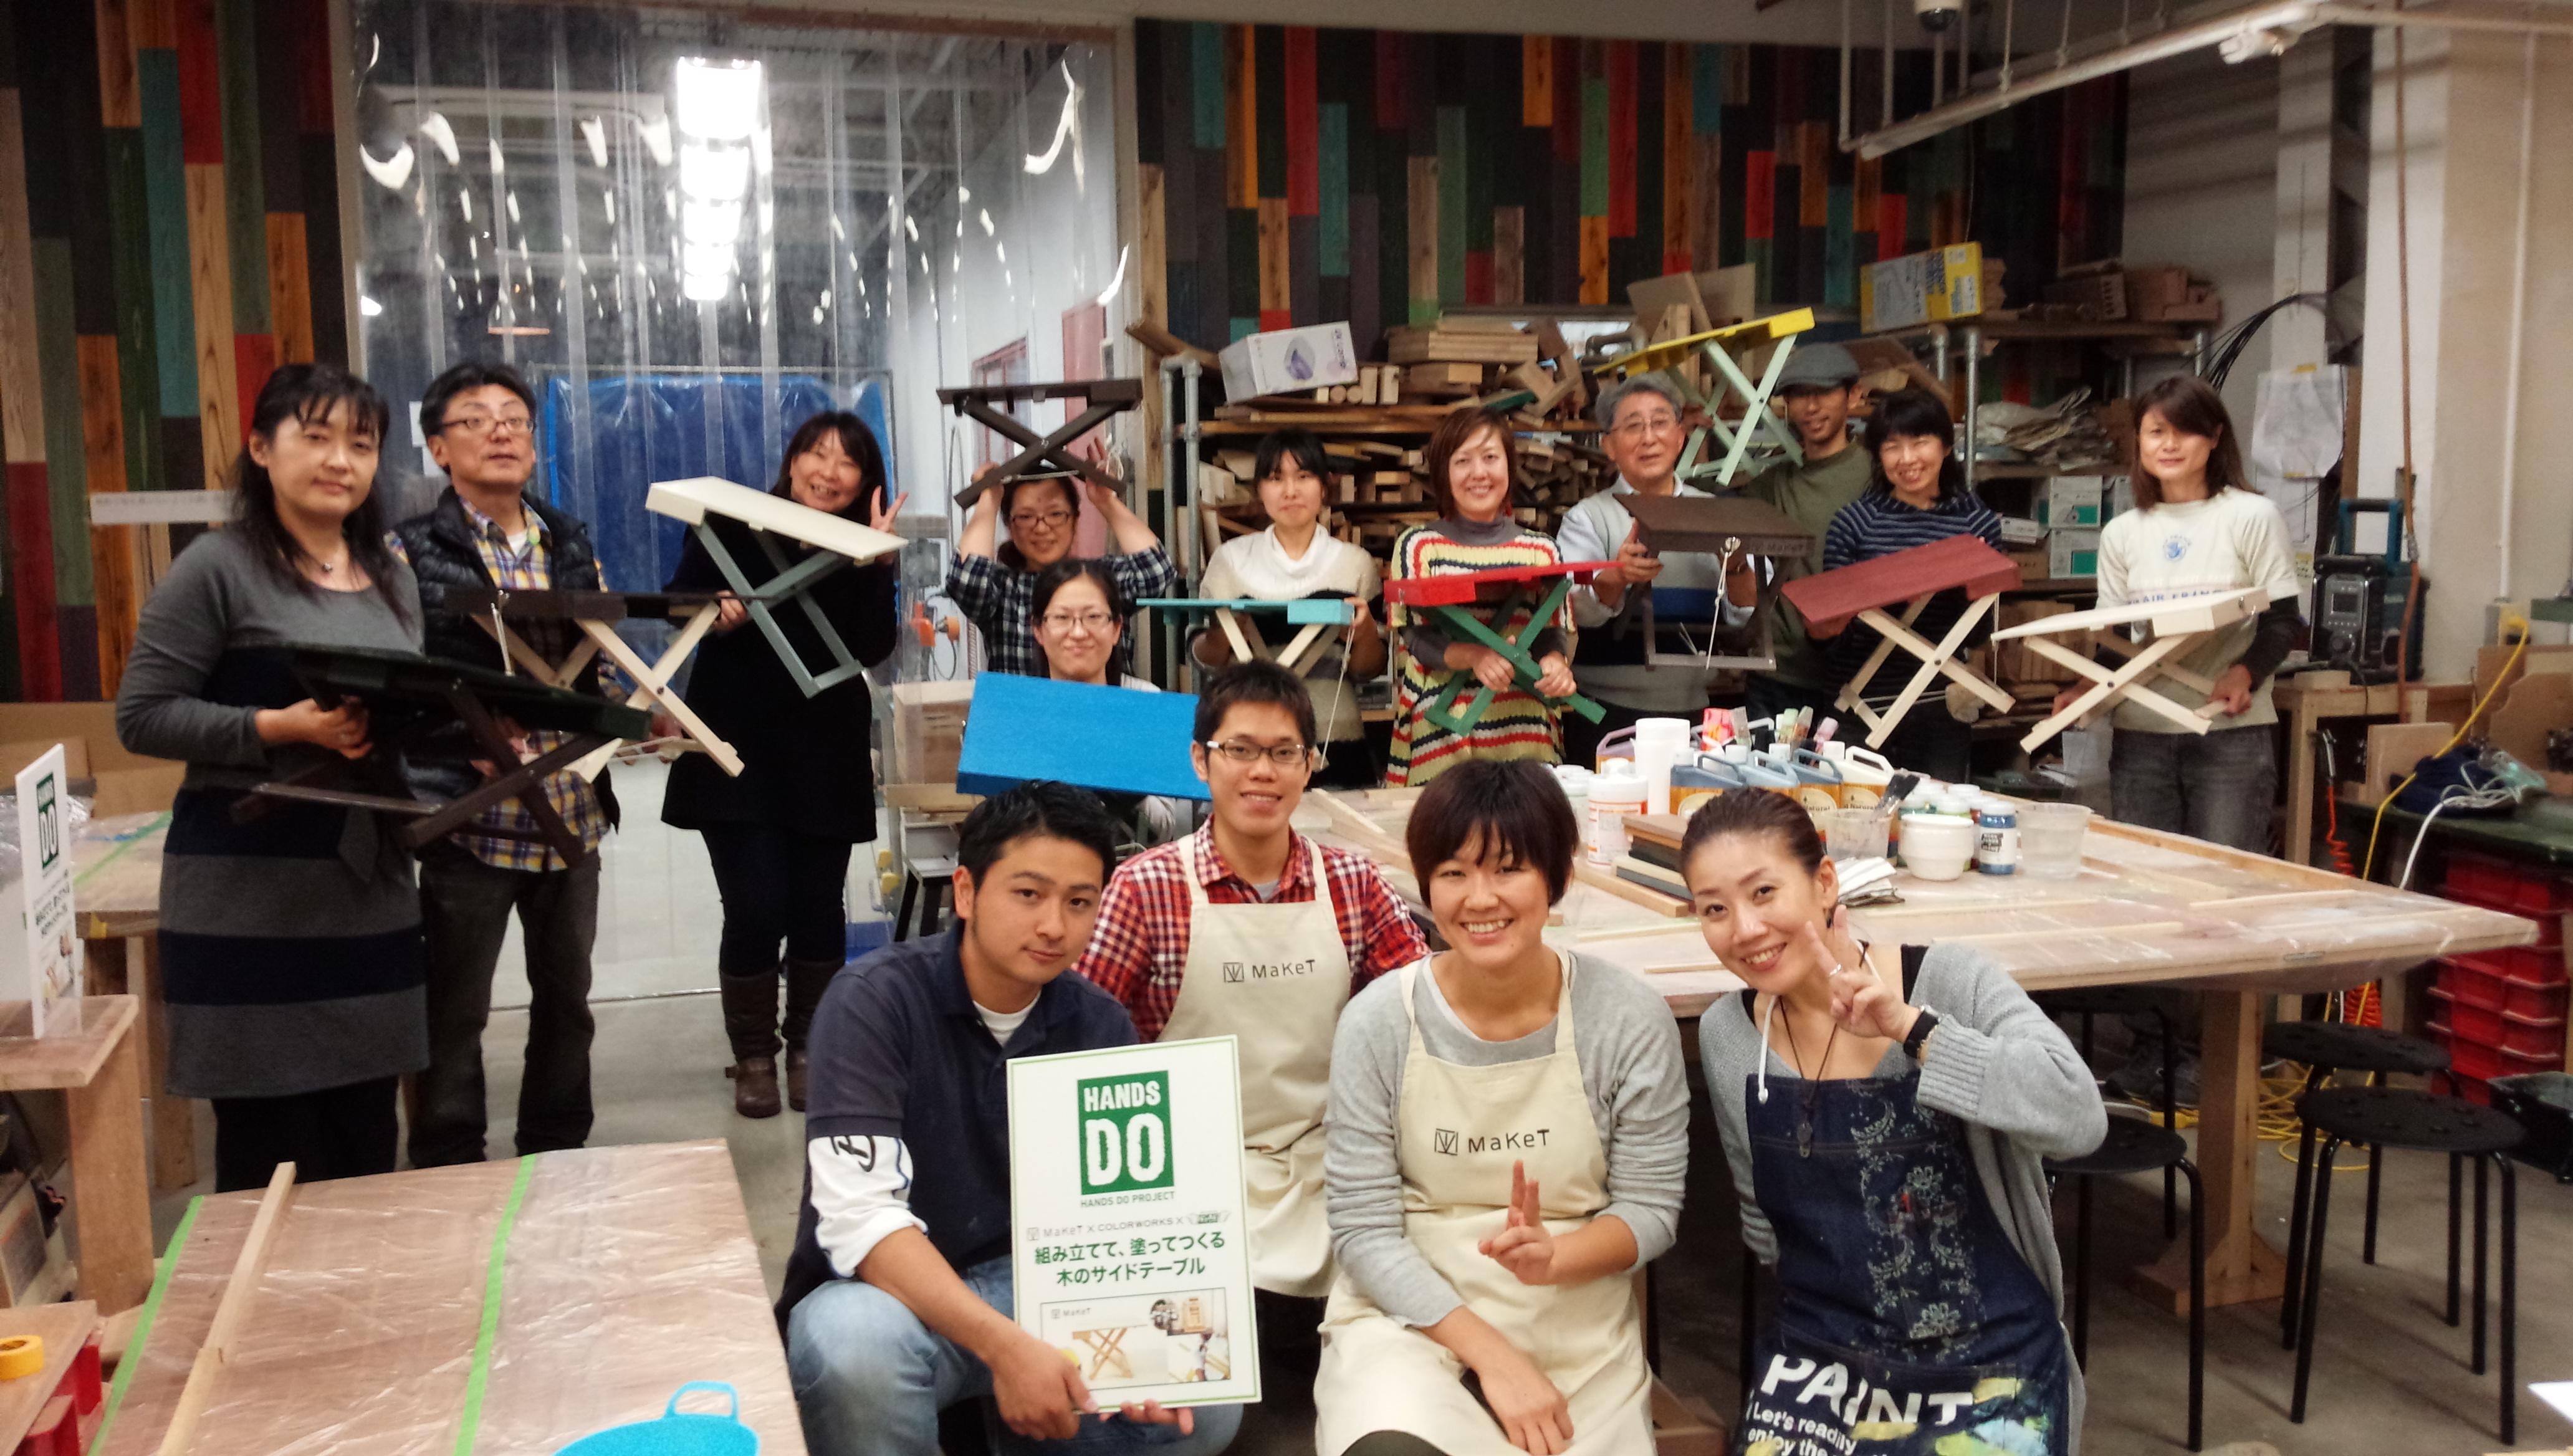 http://www.colorworks.co.jp/weblog/2014/11/12/IMG_0495.JPG